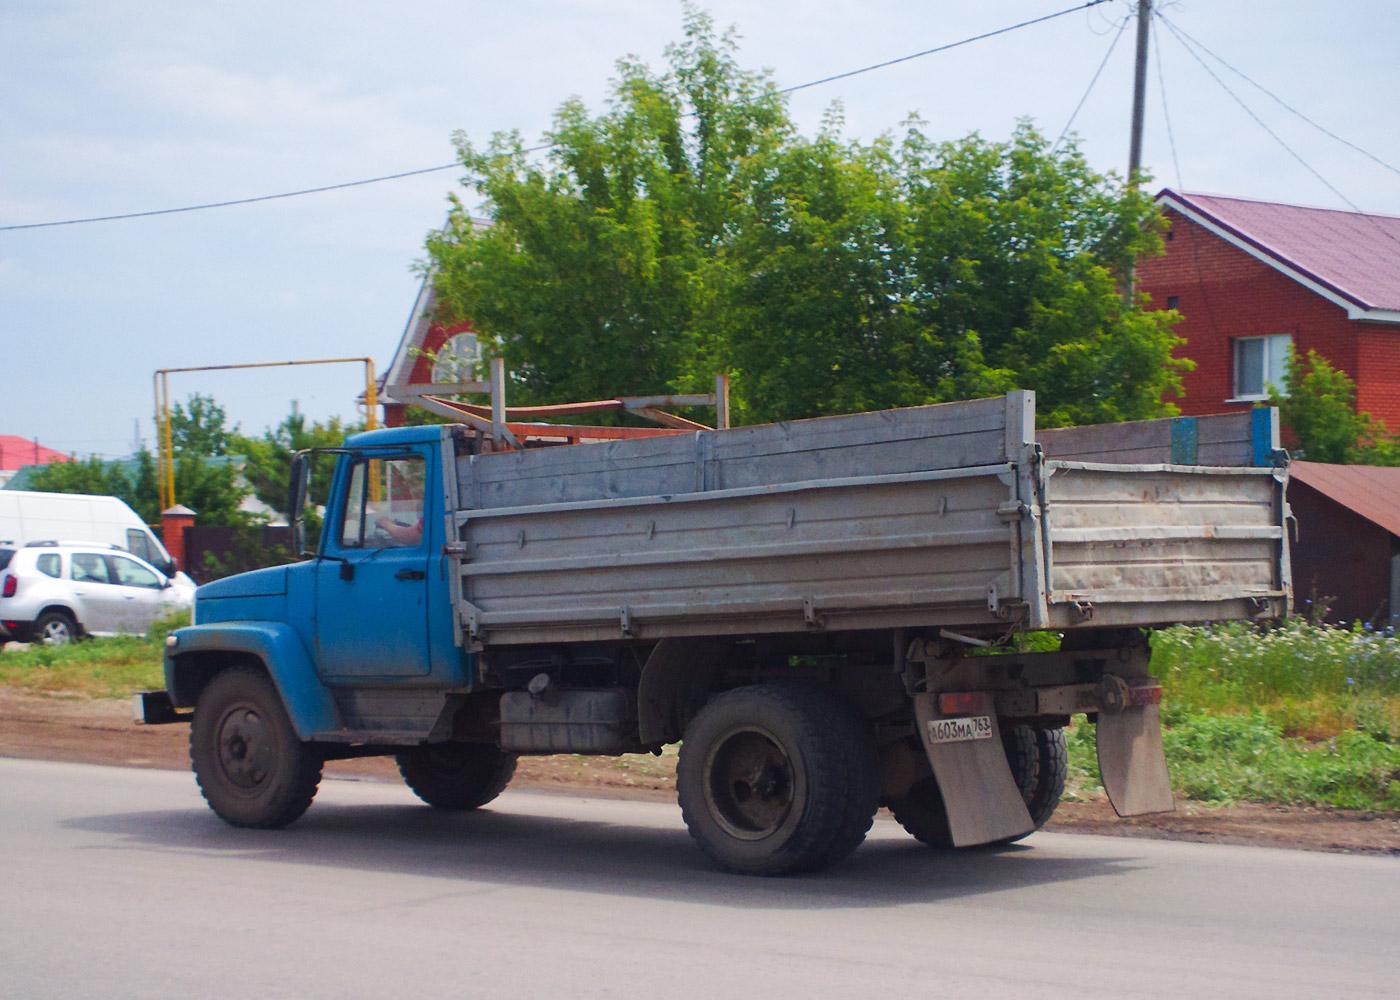 Самосвал ГАЗ-САЗ-3507 на базе ГАЗ-3307 #А603МА763. г. Самара, Новокуйбышевское шоссе